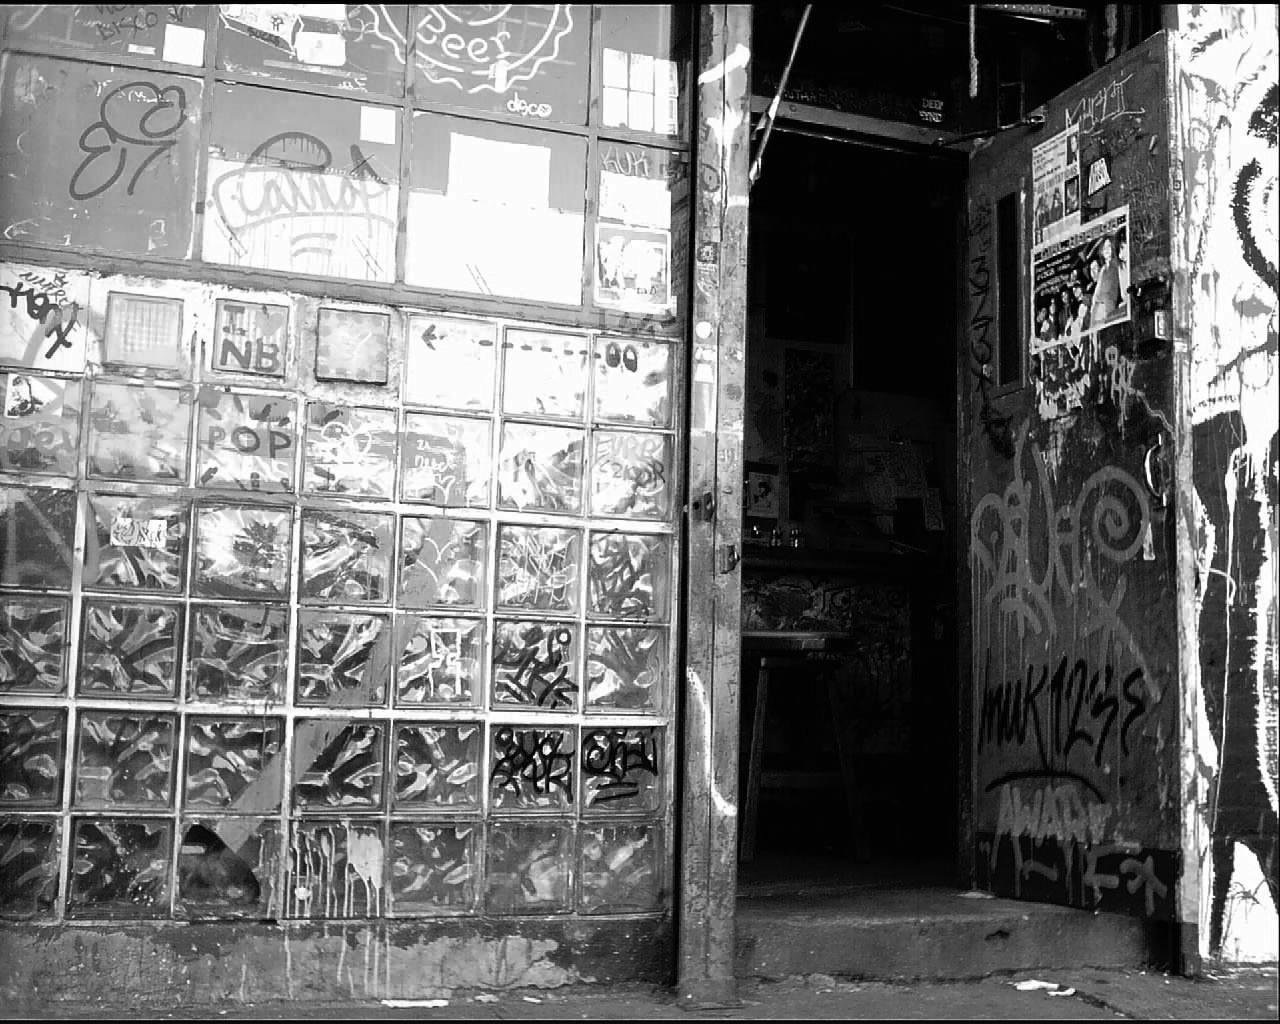 Mars Bar, E 1st & 2nd Avenue, New York City